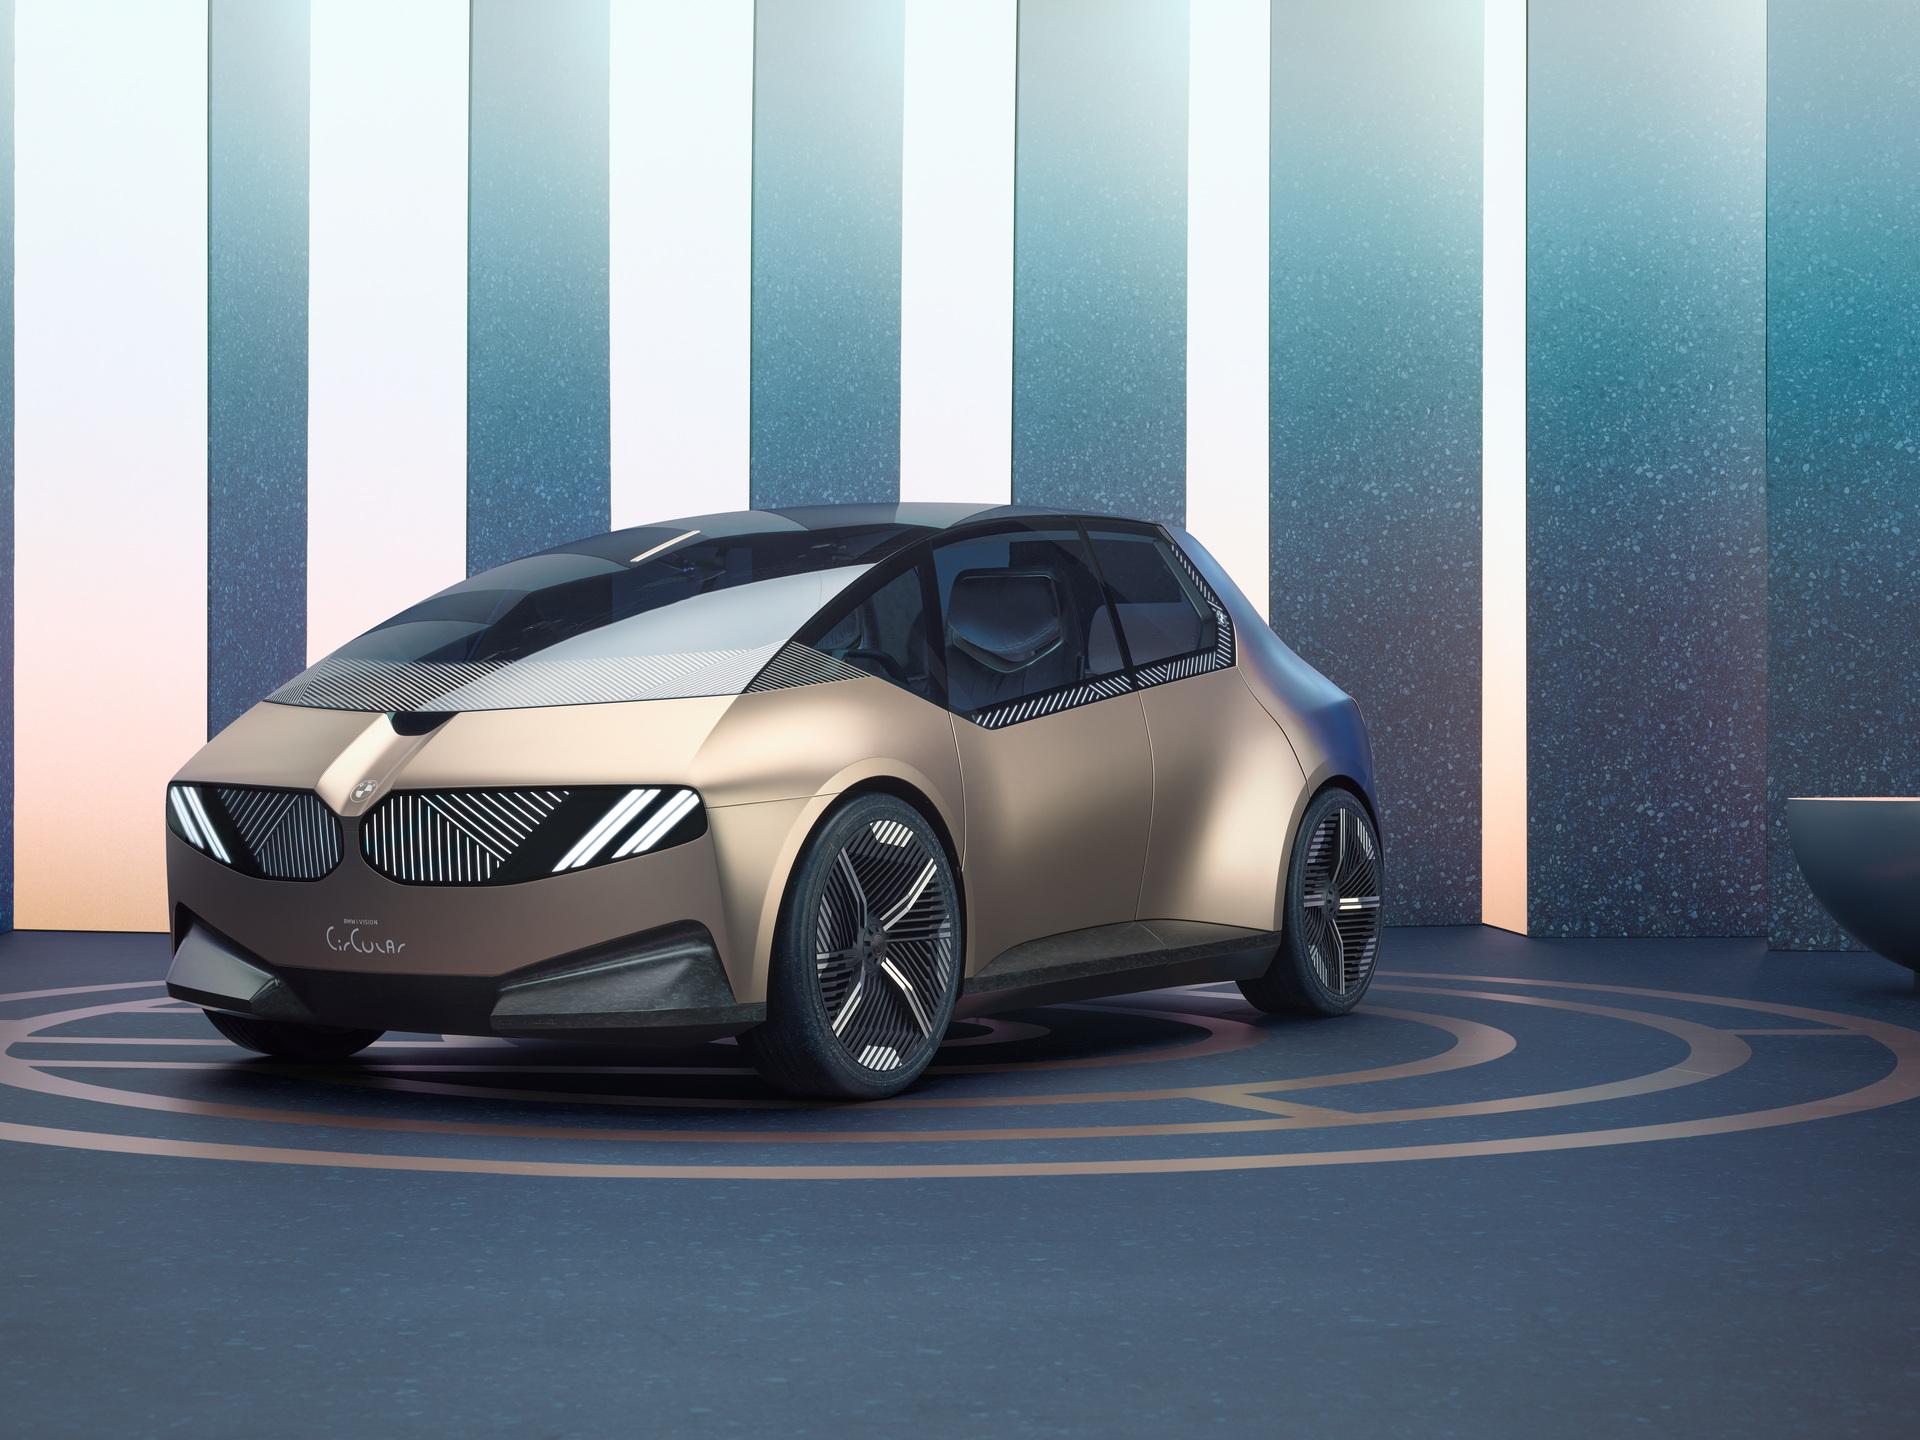 2021-BMW-Circular-concept_2.jpg